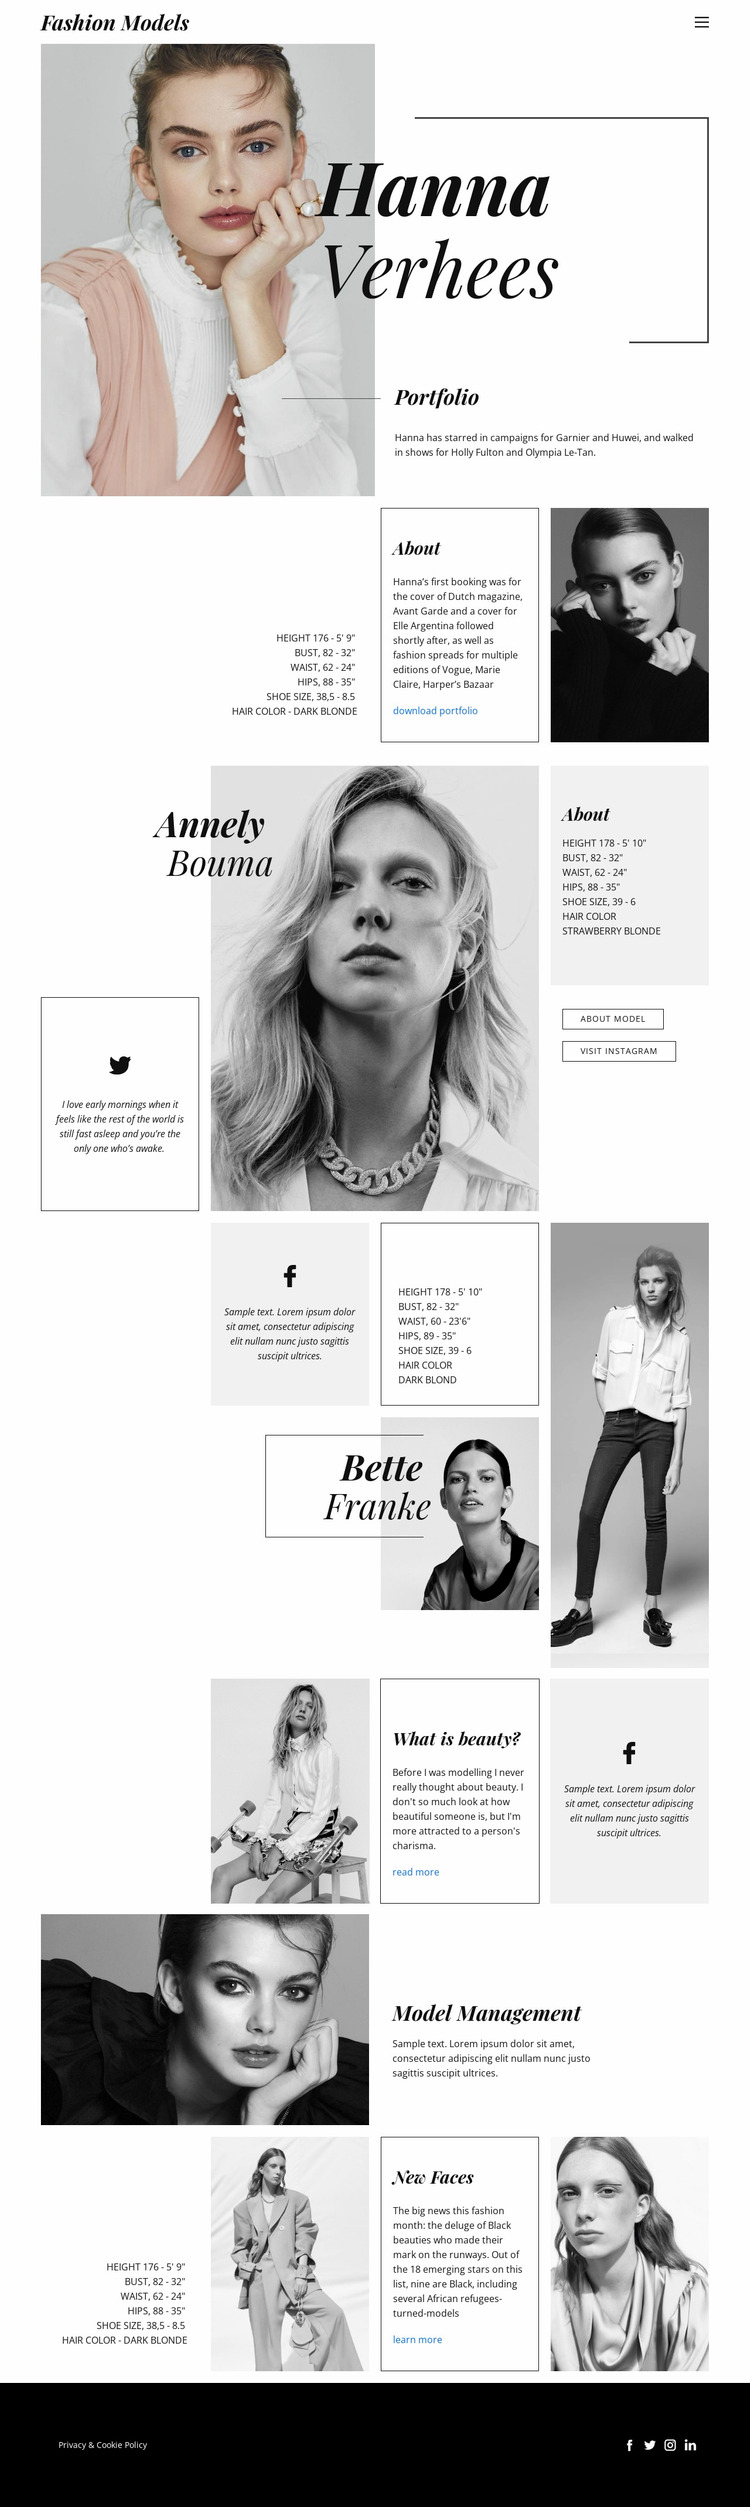 Hanna Verhees Blog Website Mockup